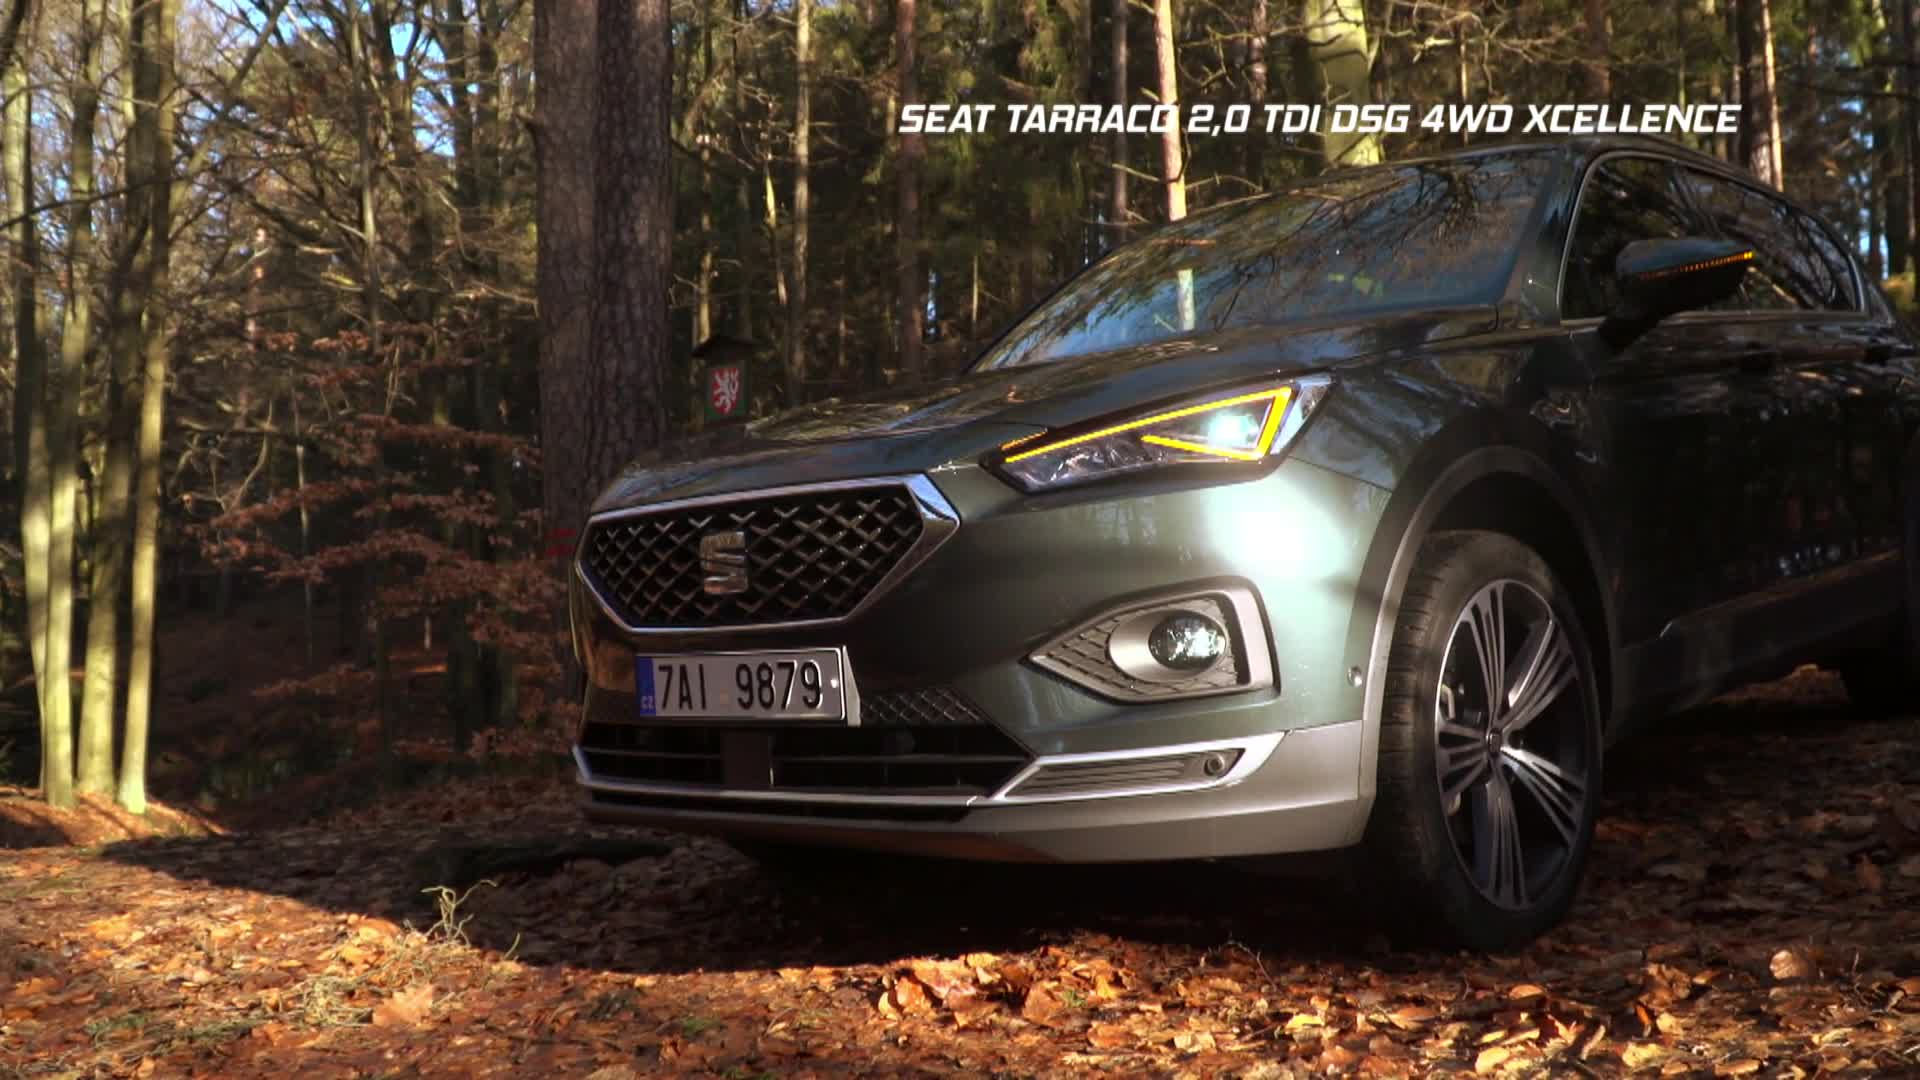 Test rodinného SUV Seat Tarraco